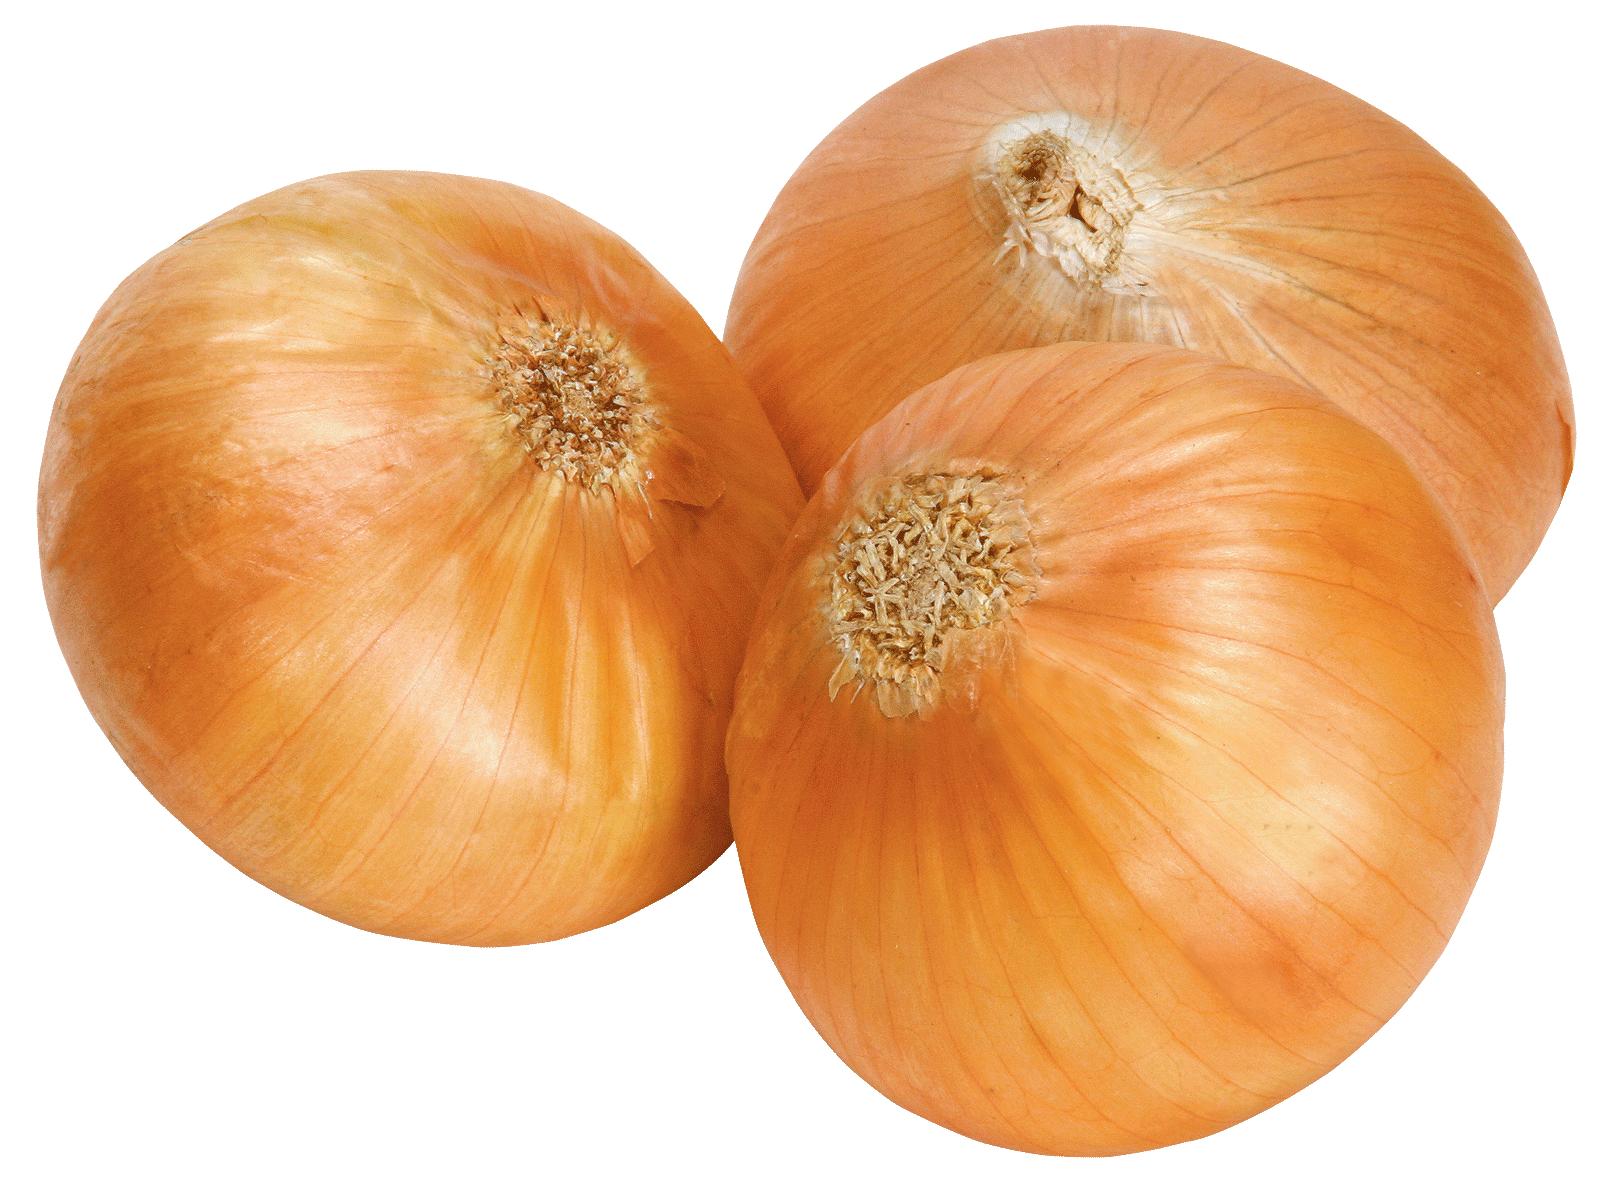 Onion Clipart - Clipart Kid